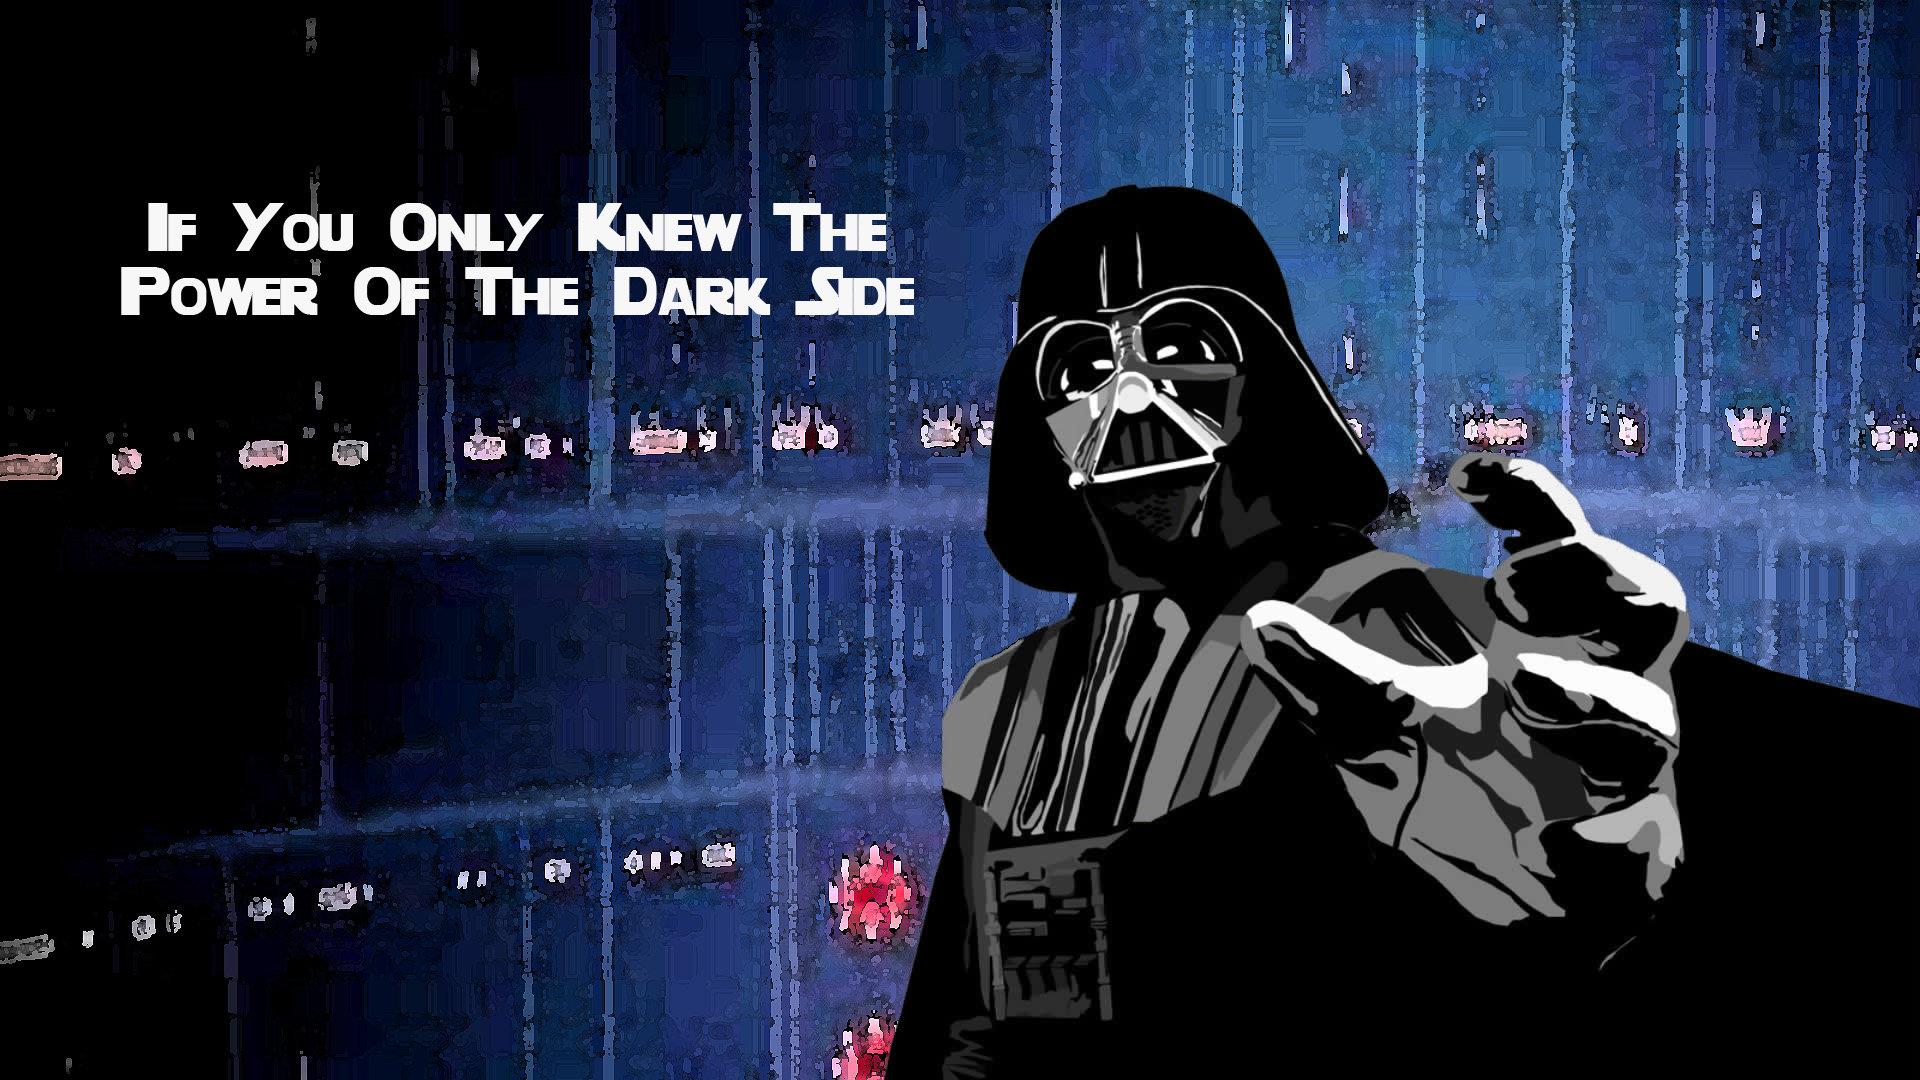 Darth Vader Wallpapers 1920x1080 Full Hd 1080p Desktop Backgrounds